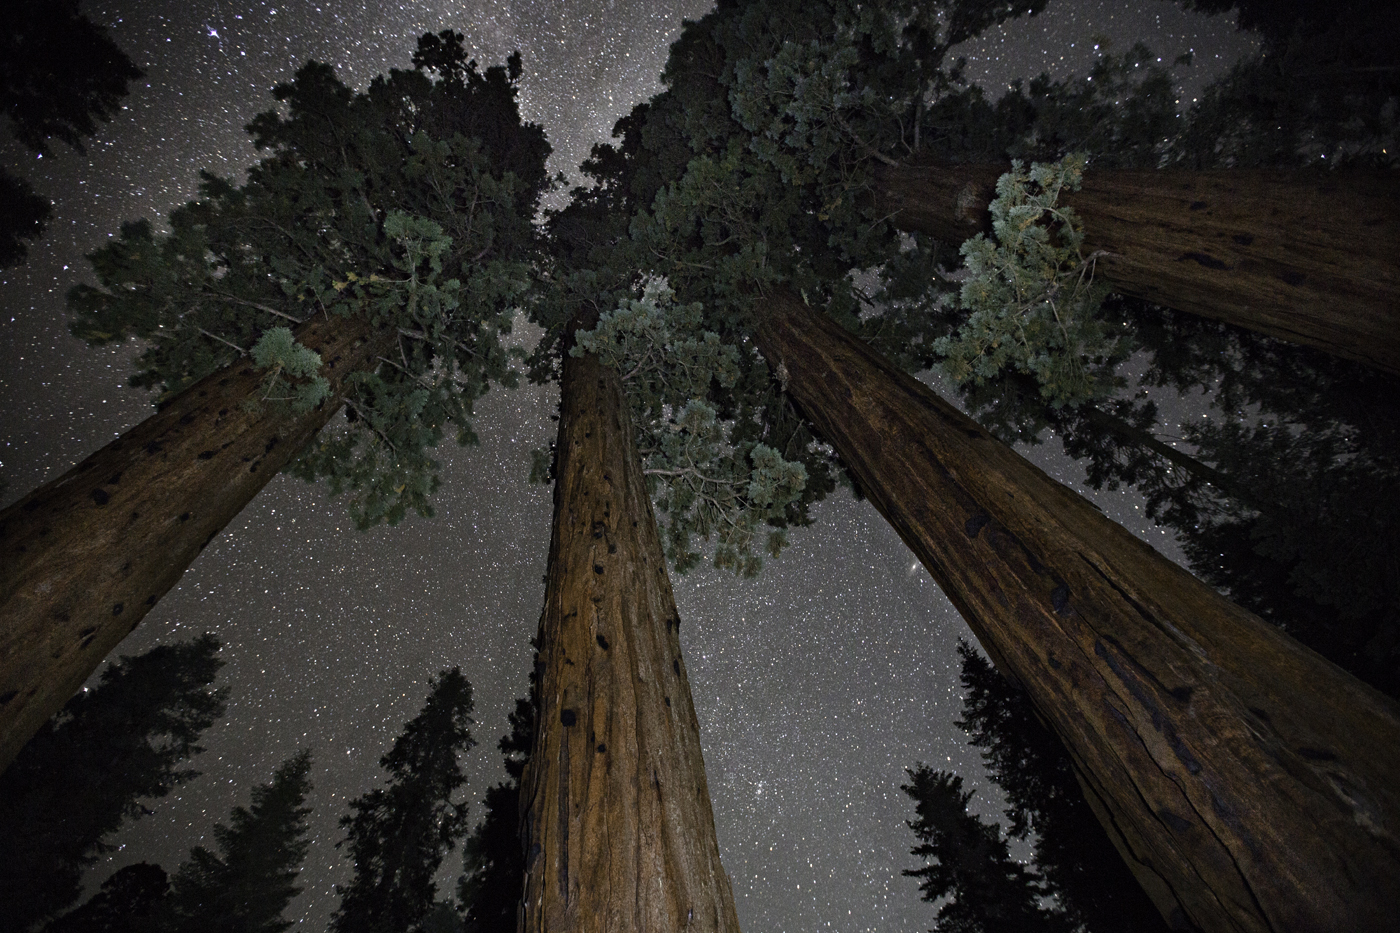 beth-moon-vieu-arbre-etoile-09